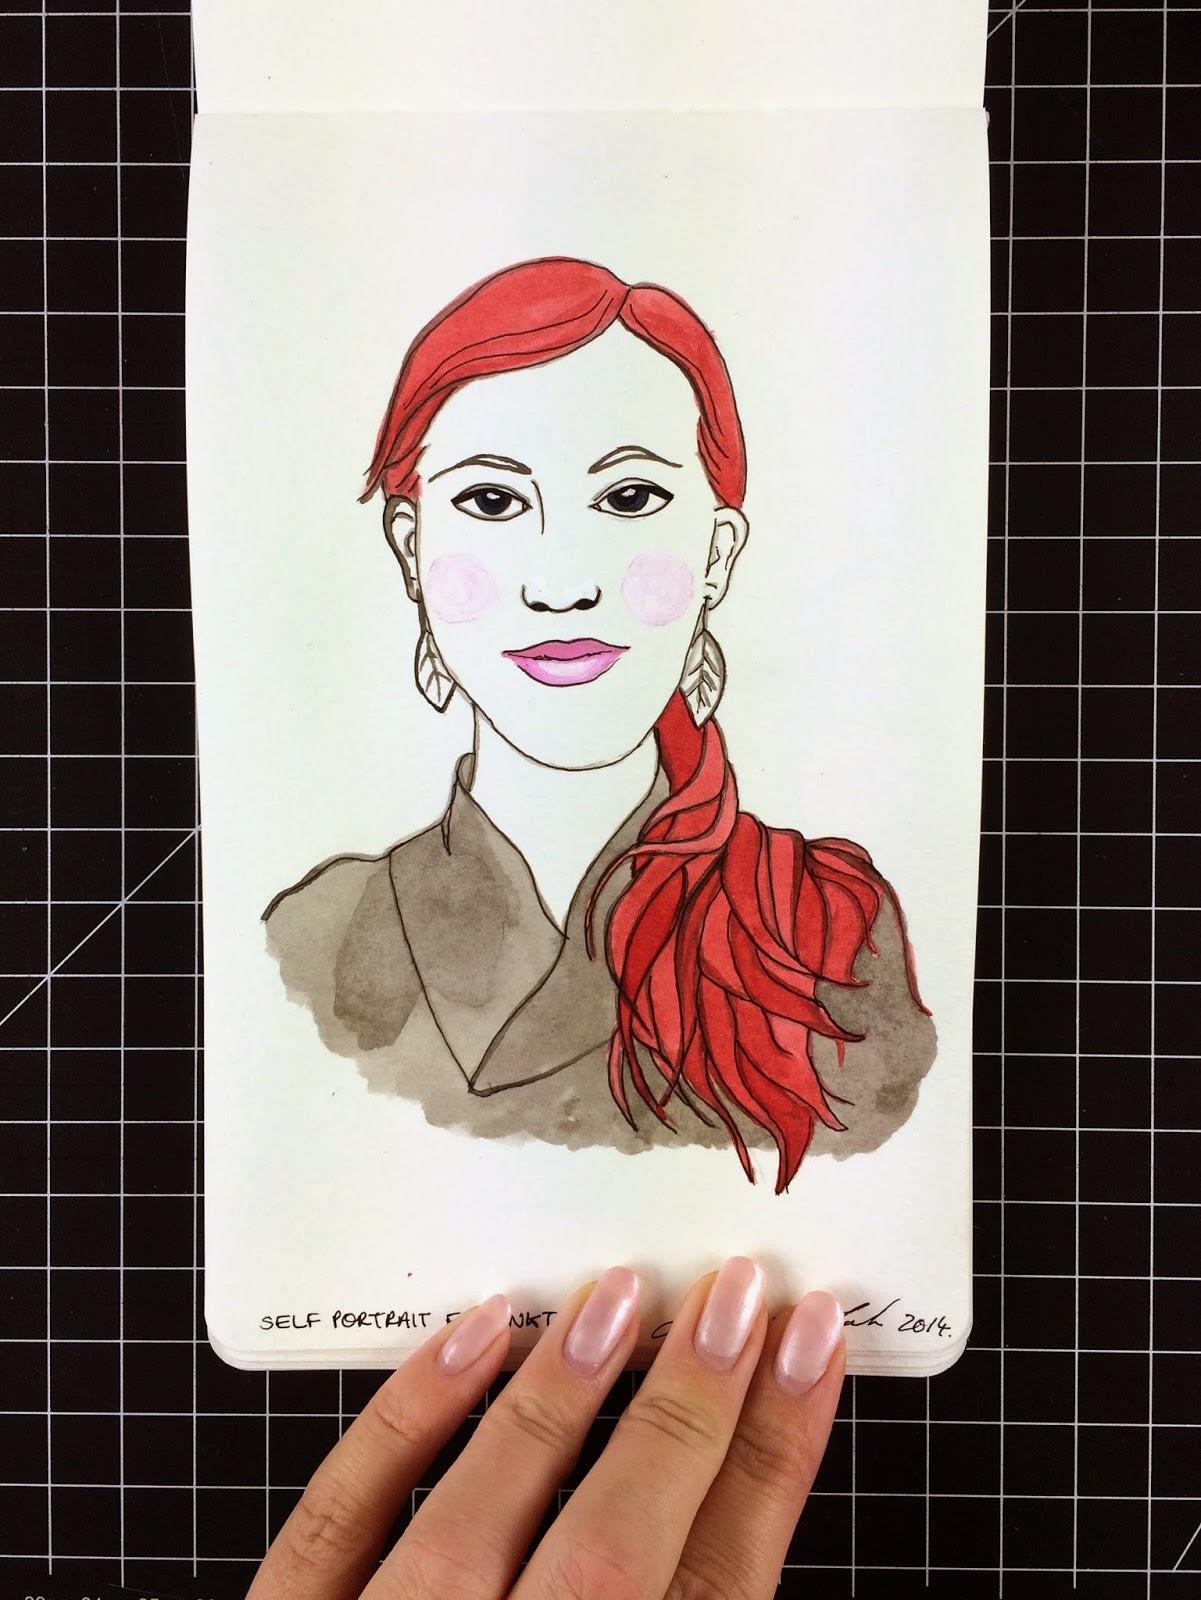 Inktober fashion illustration self portrait by Jessica Mack aka BrownPaperBunny